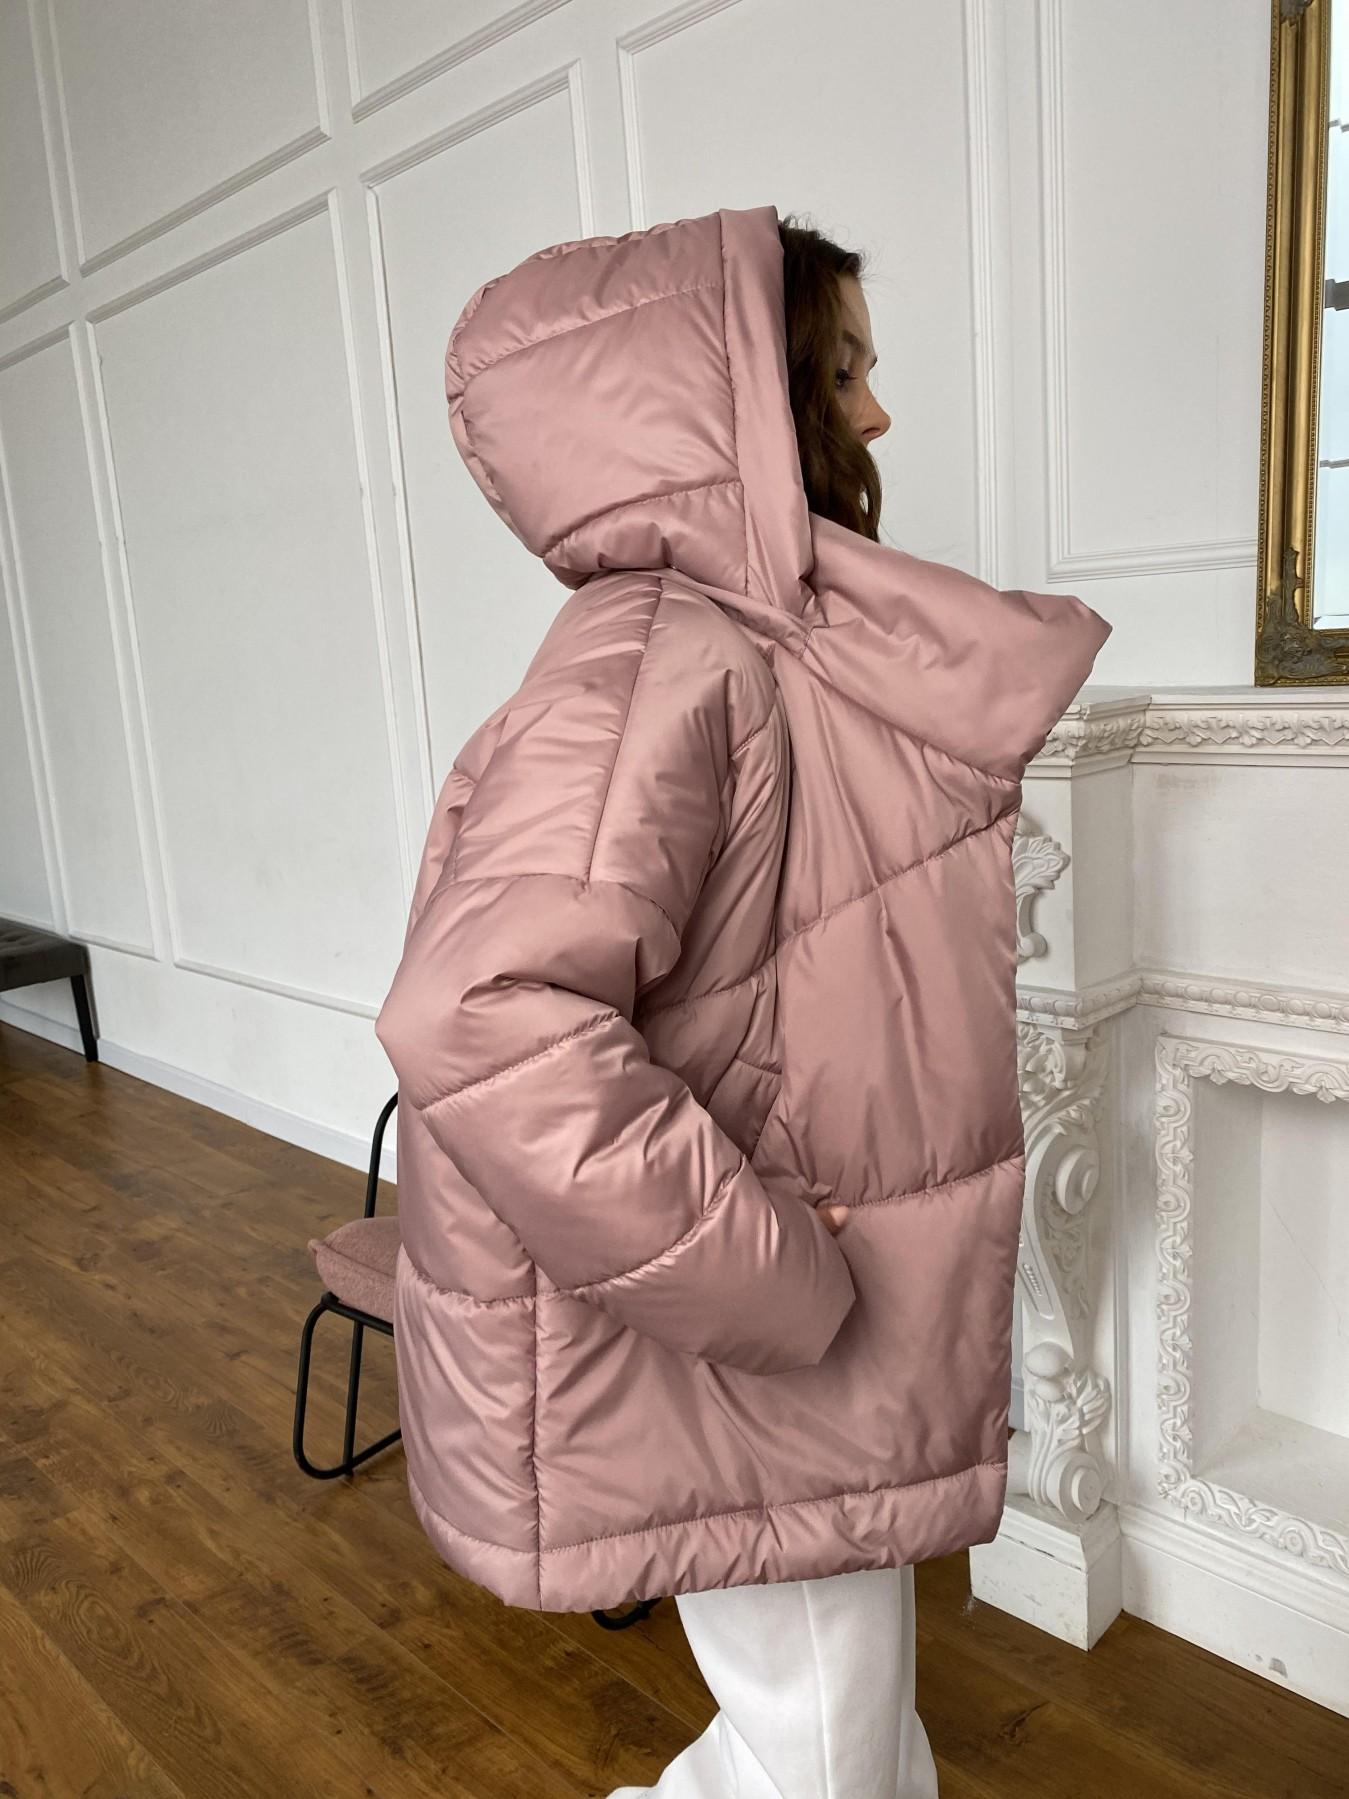 Уно куртка плащевка Ammy 10671 АРТ. 47409 Цвет: Пудра - фото 7, интернет магазин tm-modus.ru